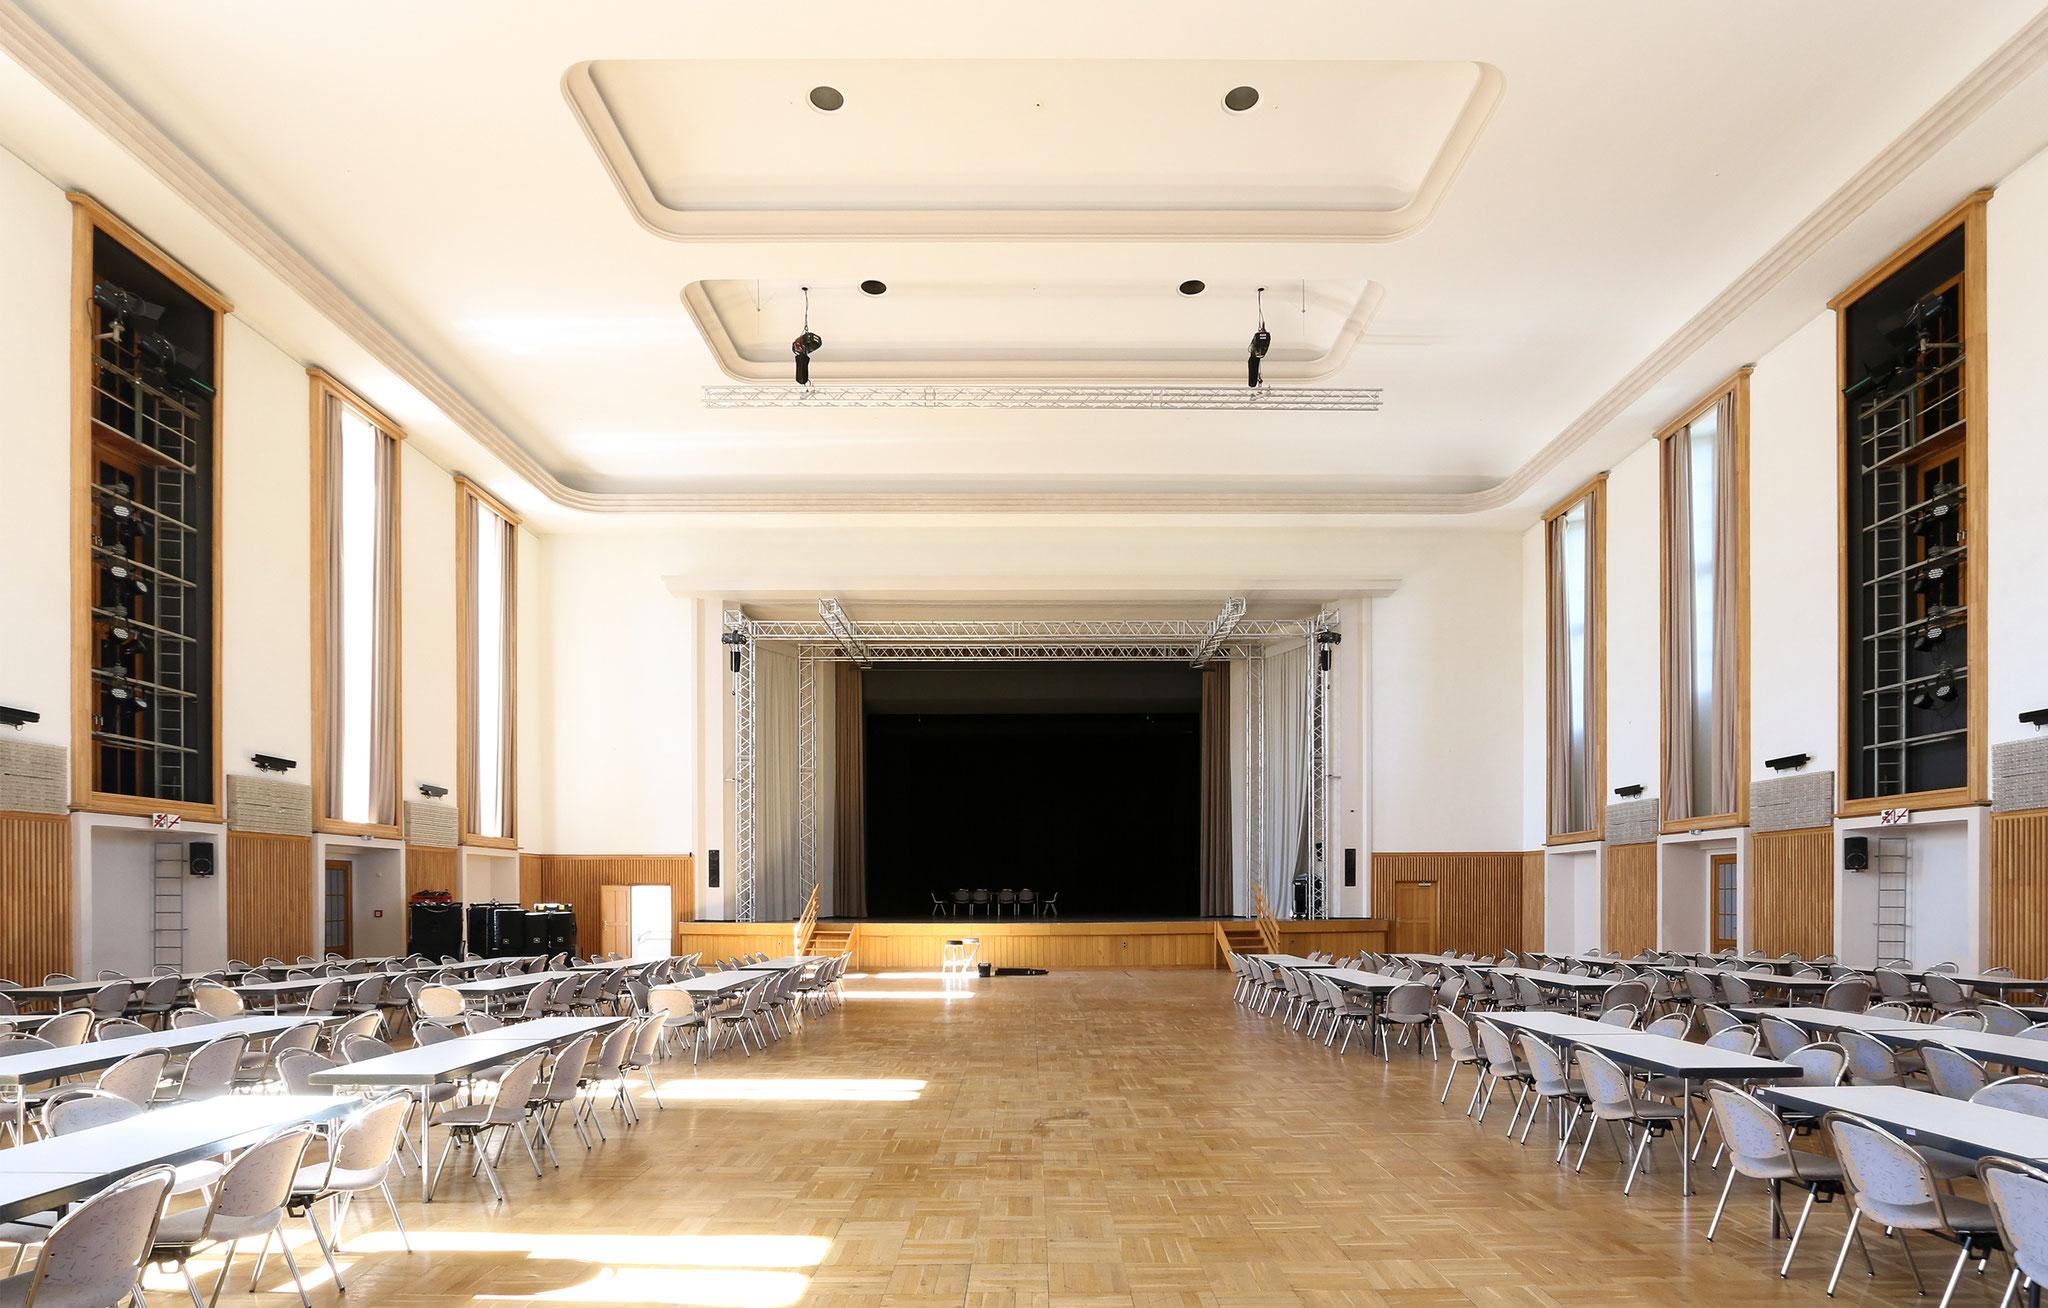 Festsaal des Kulturhaus Magdeburg